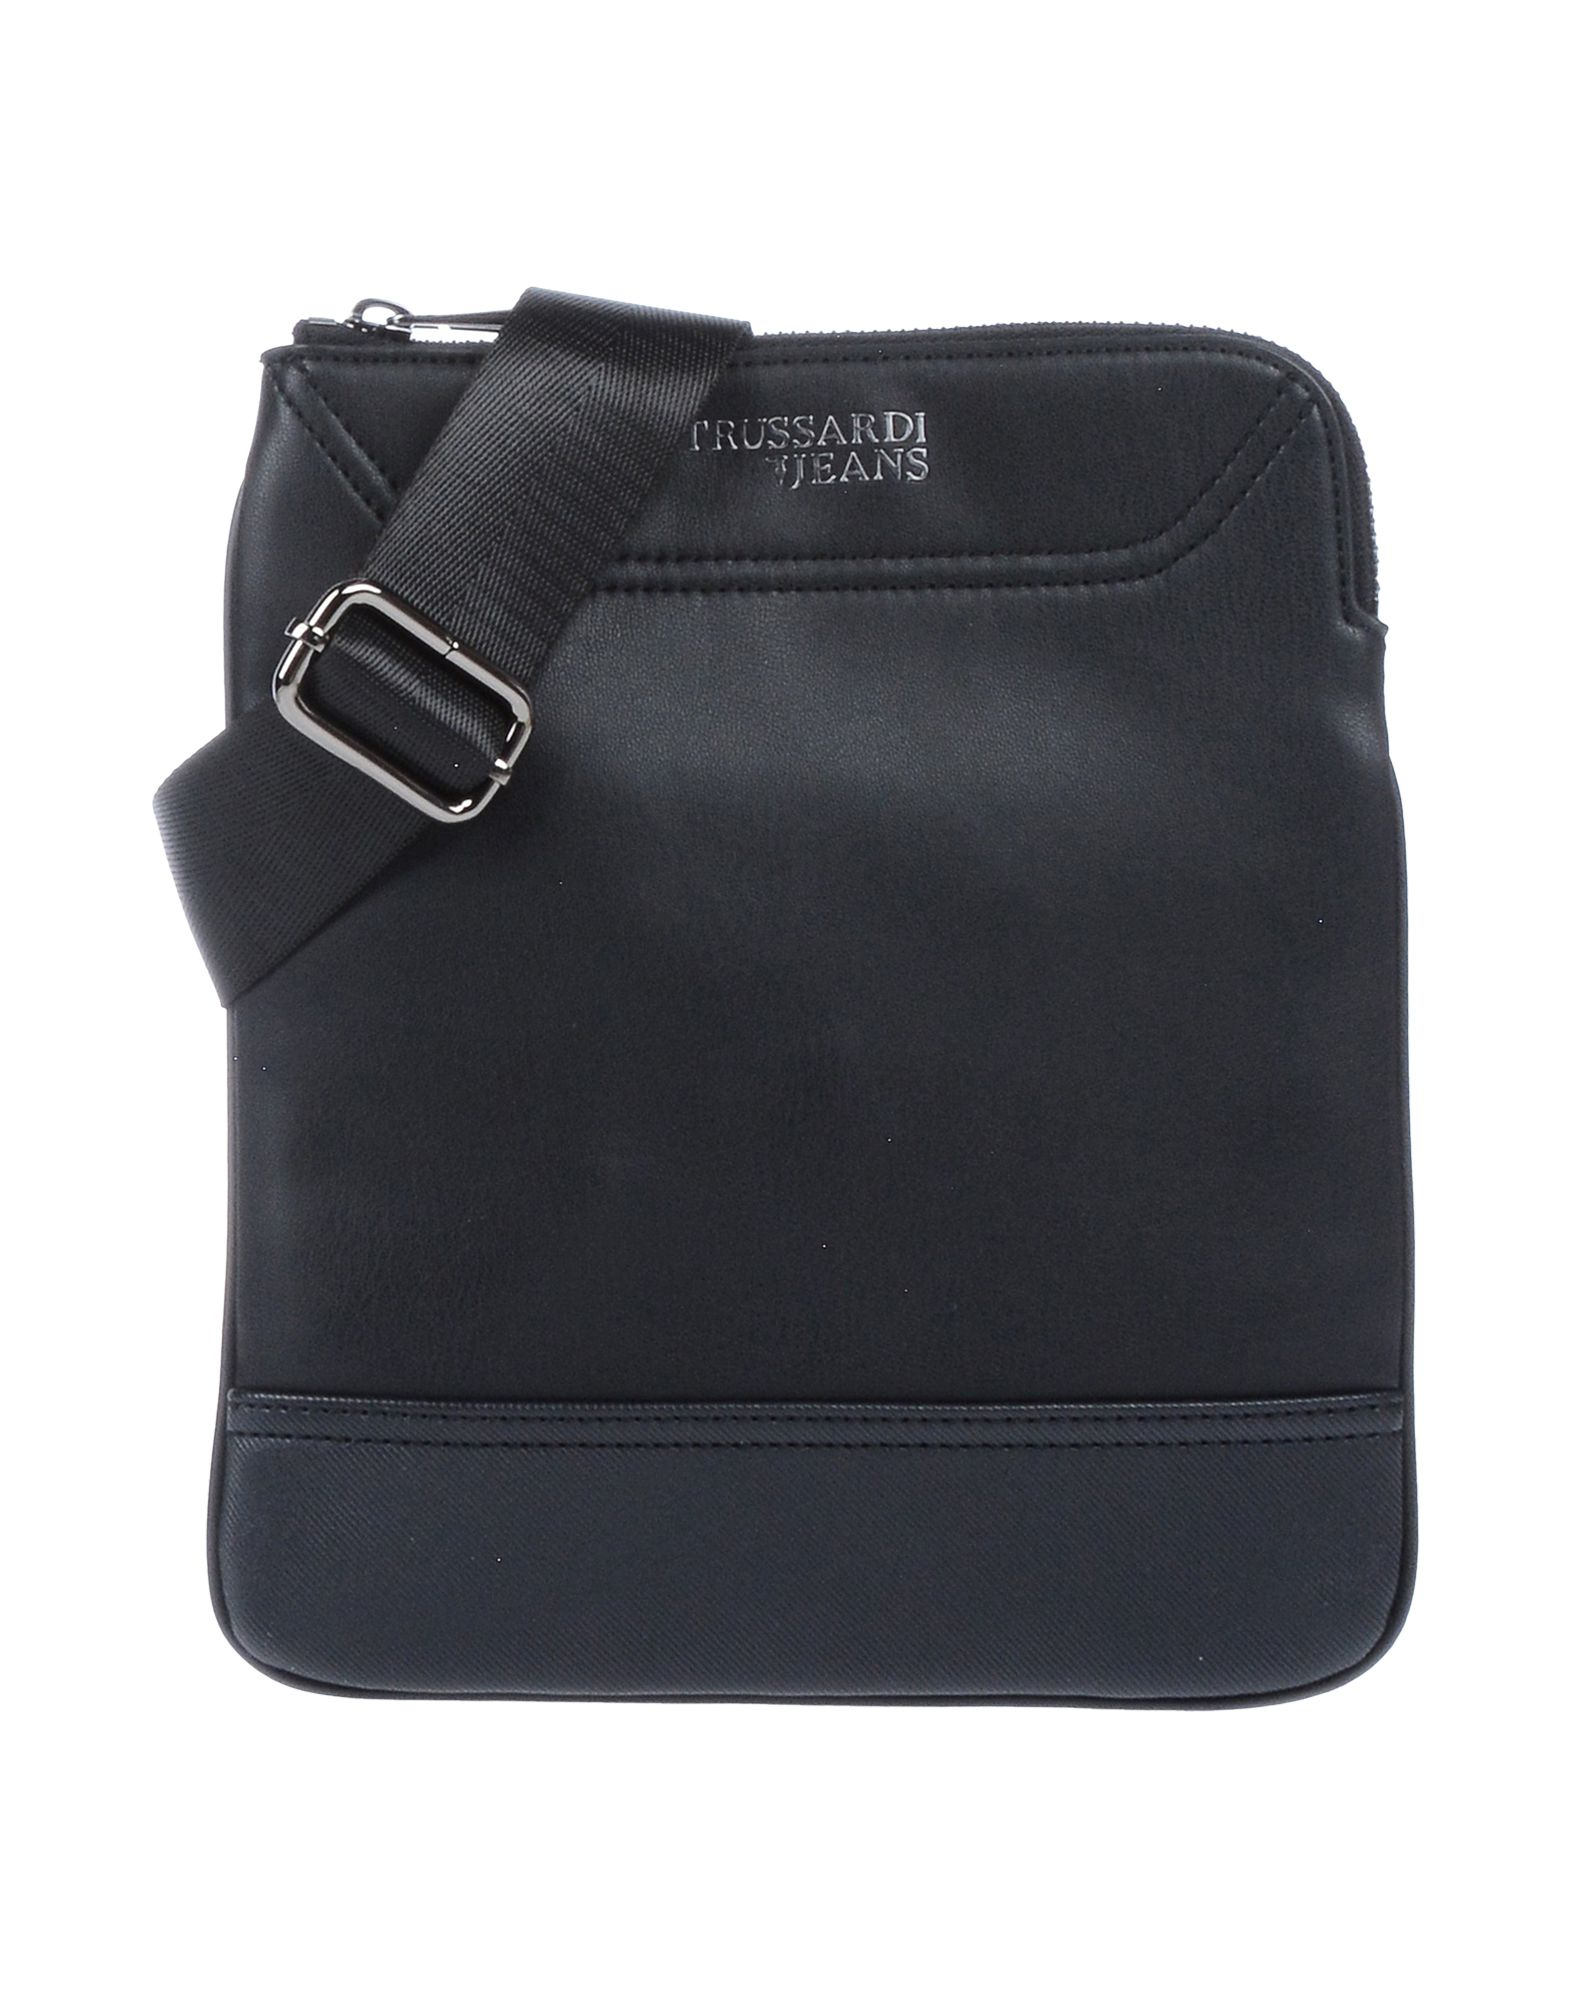 Фото - TRUSSARDI JEANS Сумка через плечо trussardi jeans сумка через плечо